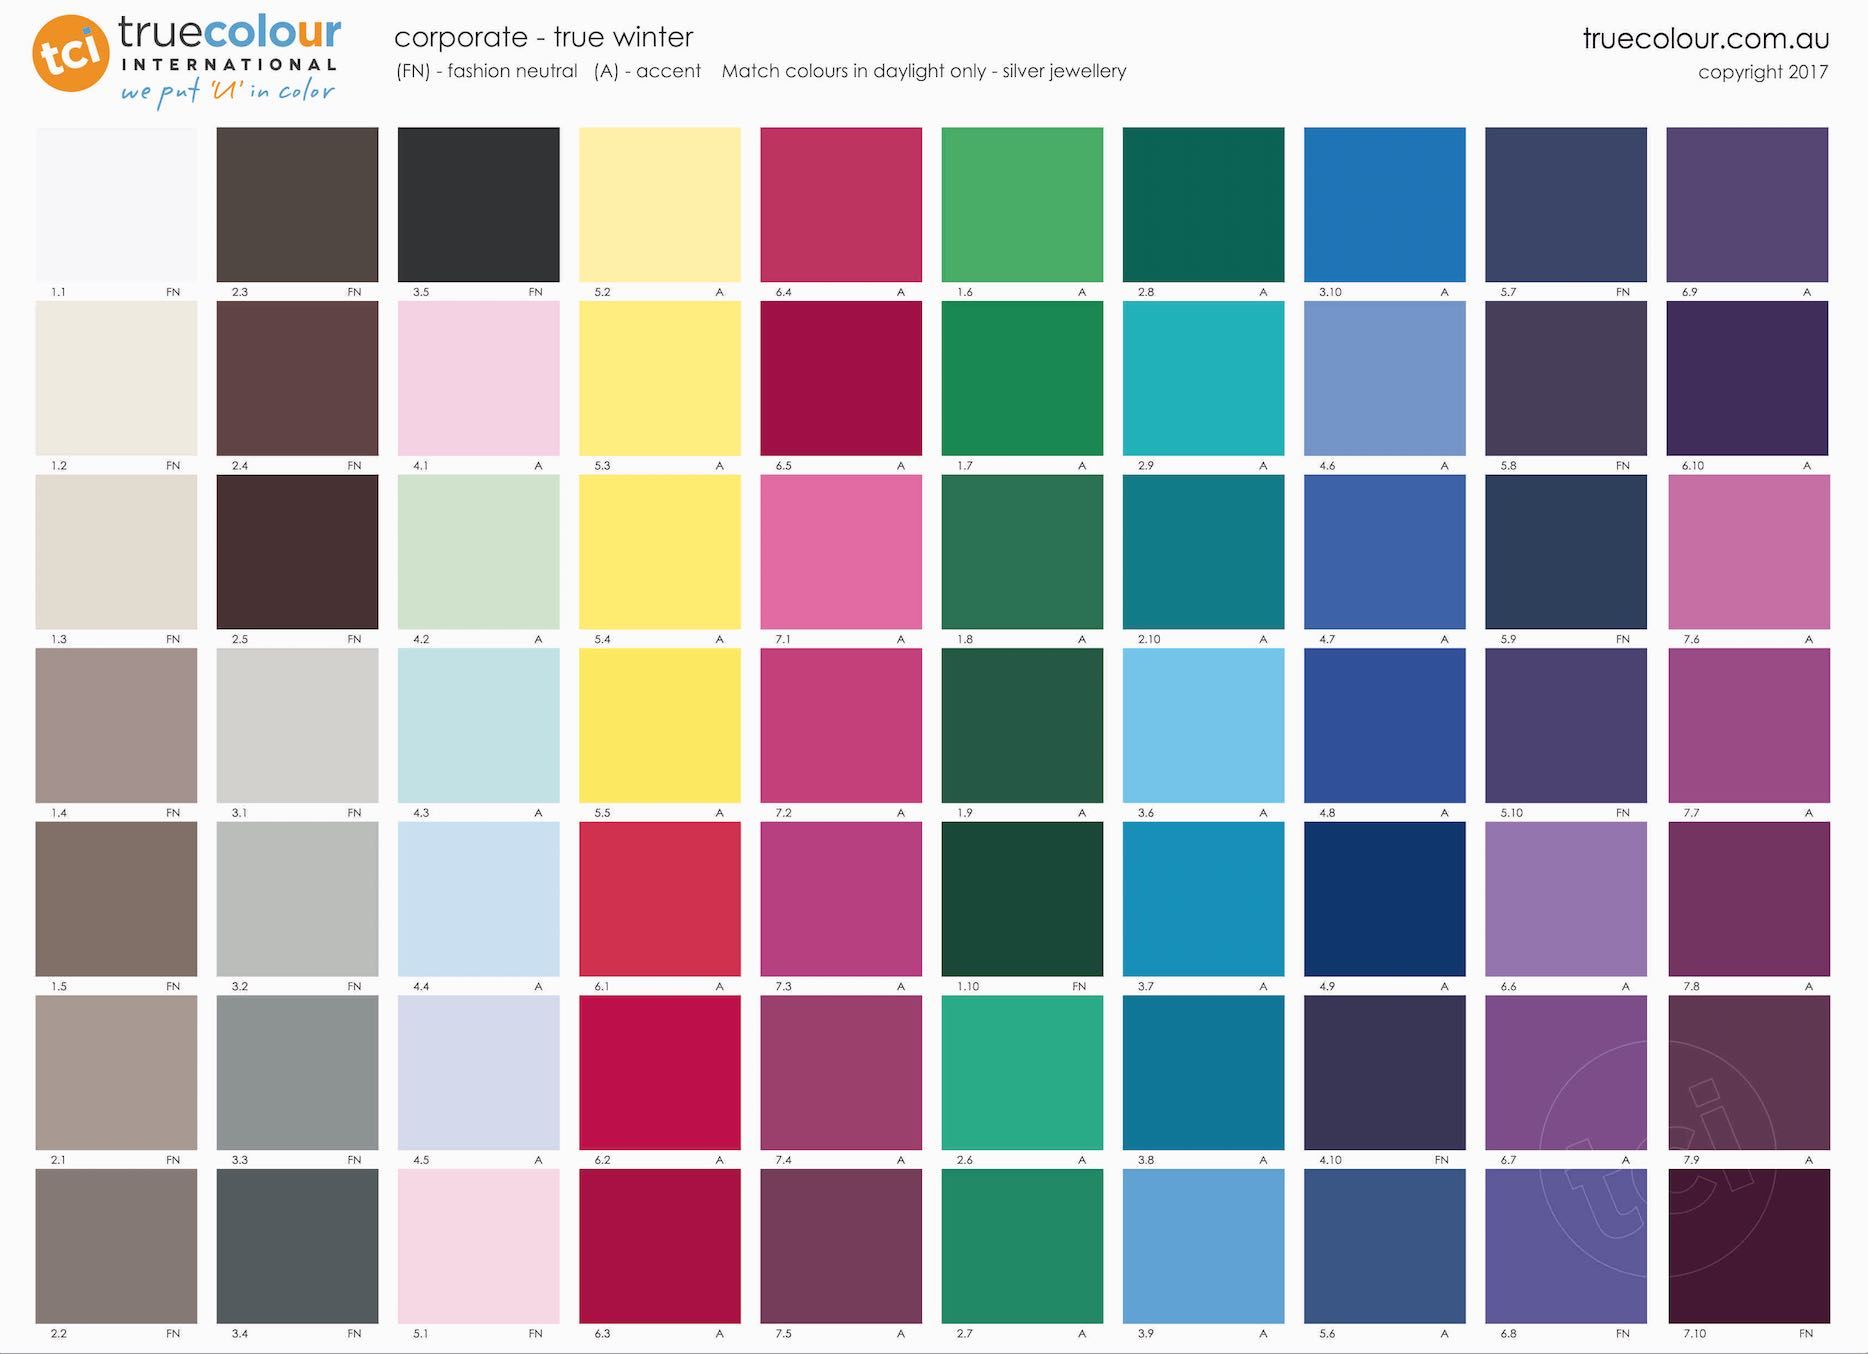 True Winter Poster - Corporate - True Colour International